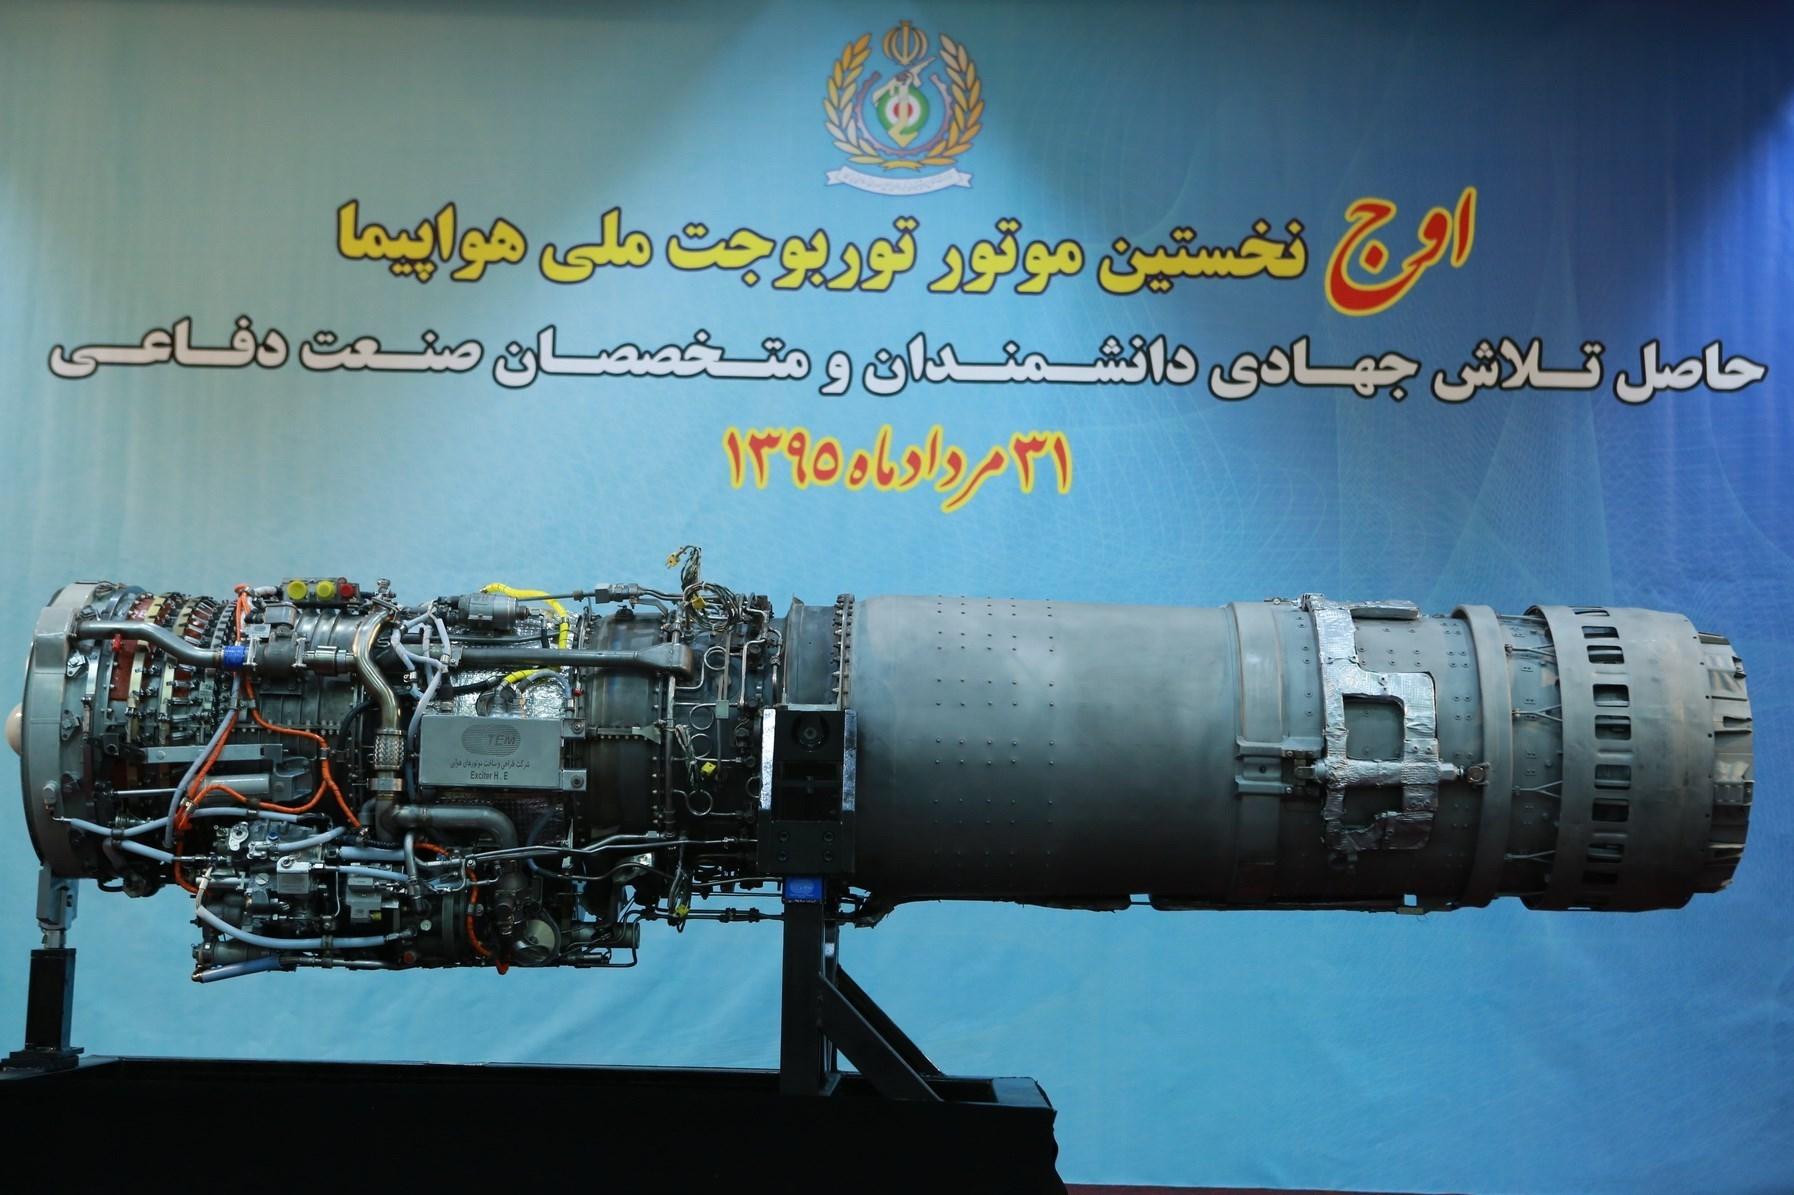 مشخصات اولین موتور ملی توربوجت ایرانی + تصاویر